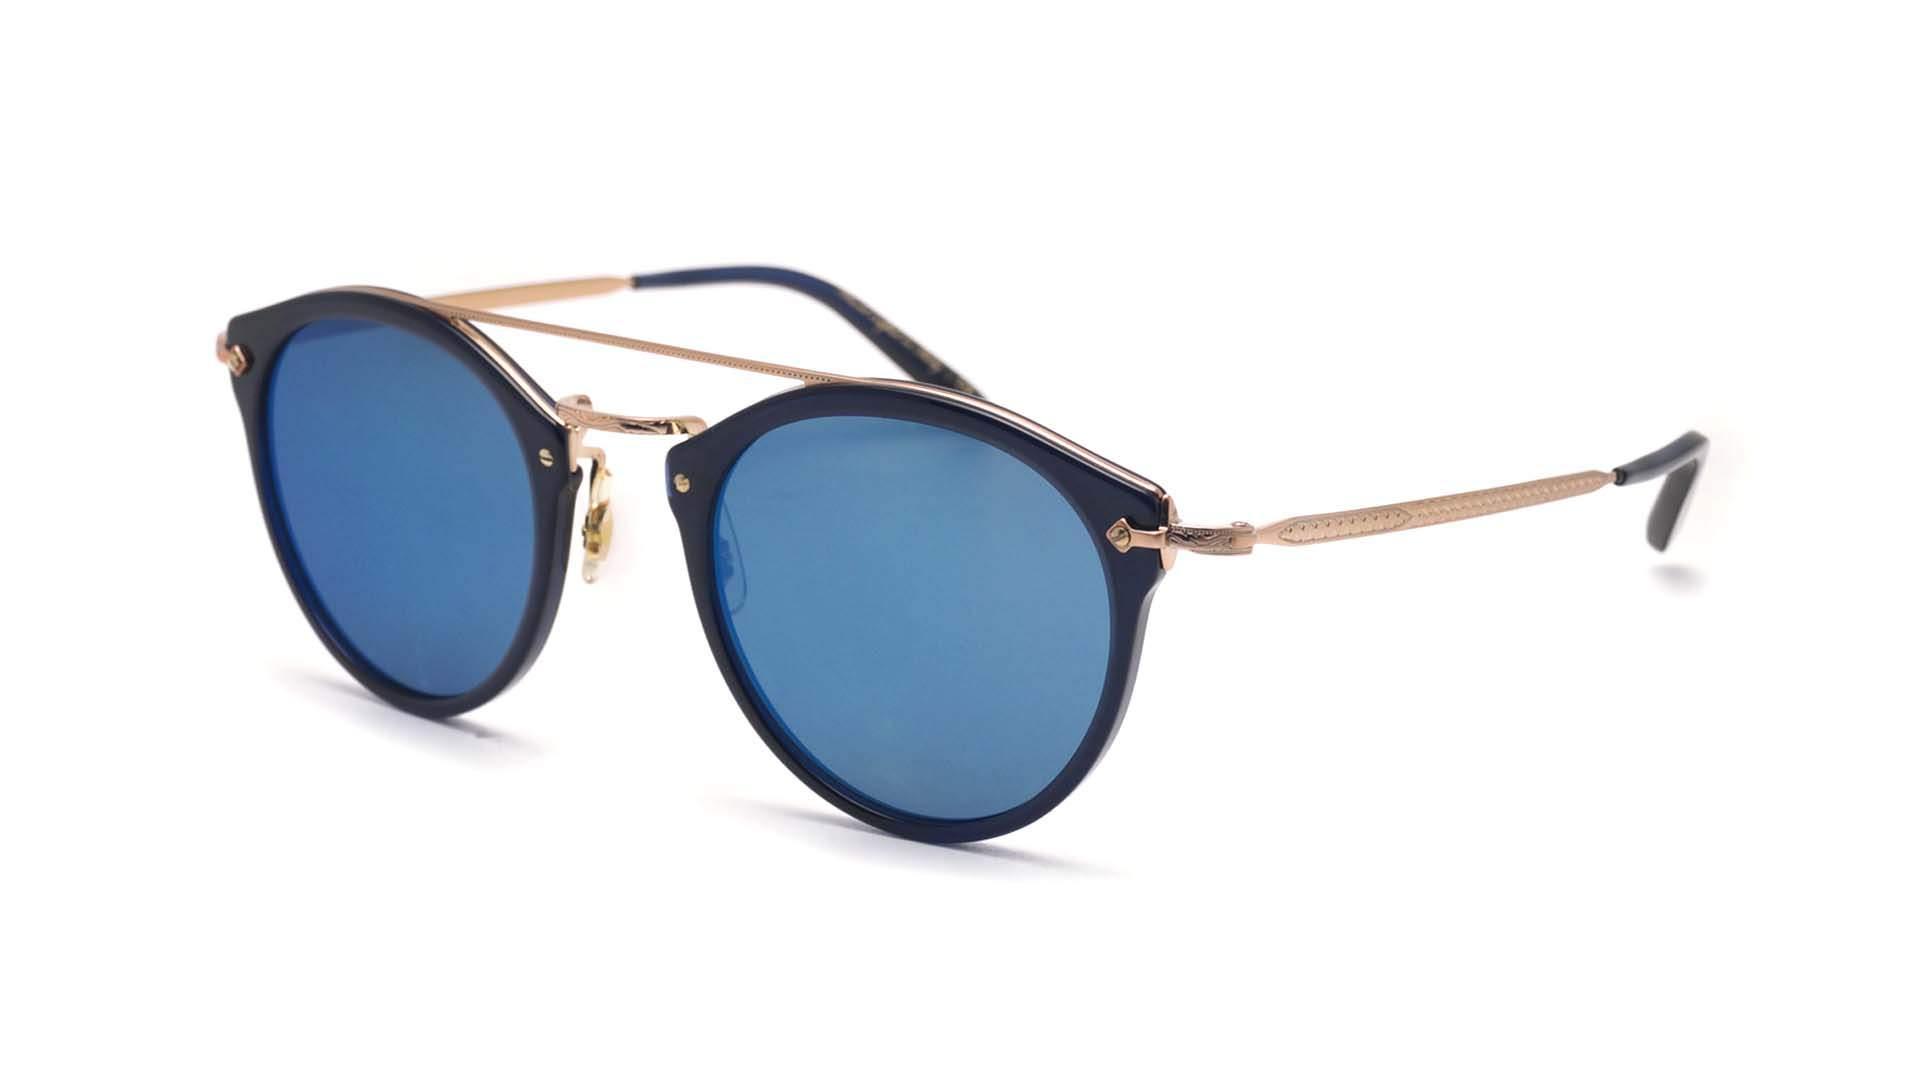 a0fac30308 Sunglasses Oliver peoples Remick Blue OV5349S 156696 50-24 Medium Mirror